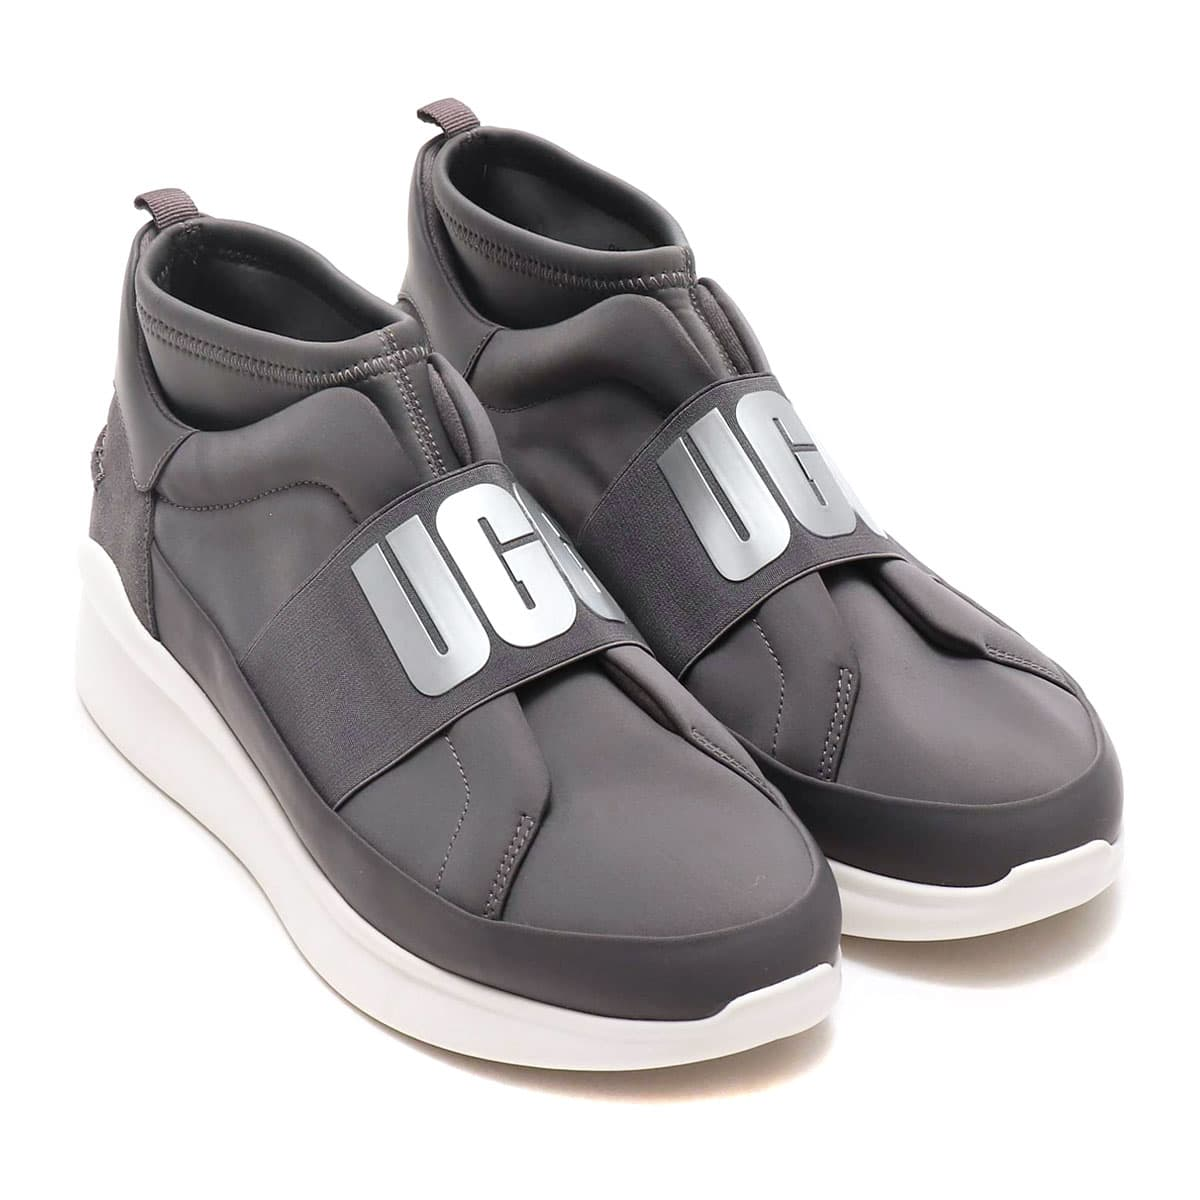 c98f7299e1f UGG Neutra Sneaker (アグ ニュートラ スニーカー)CHARCOAL【レディース ...